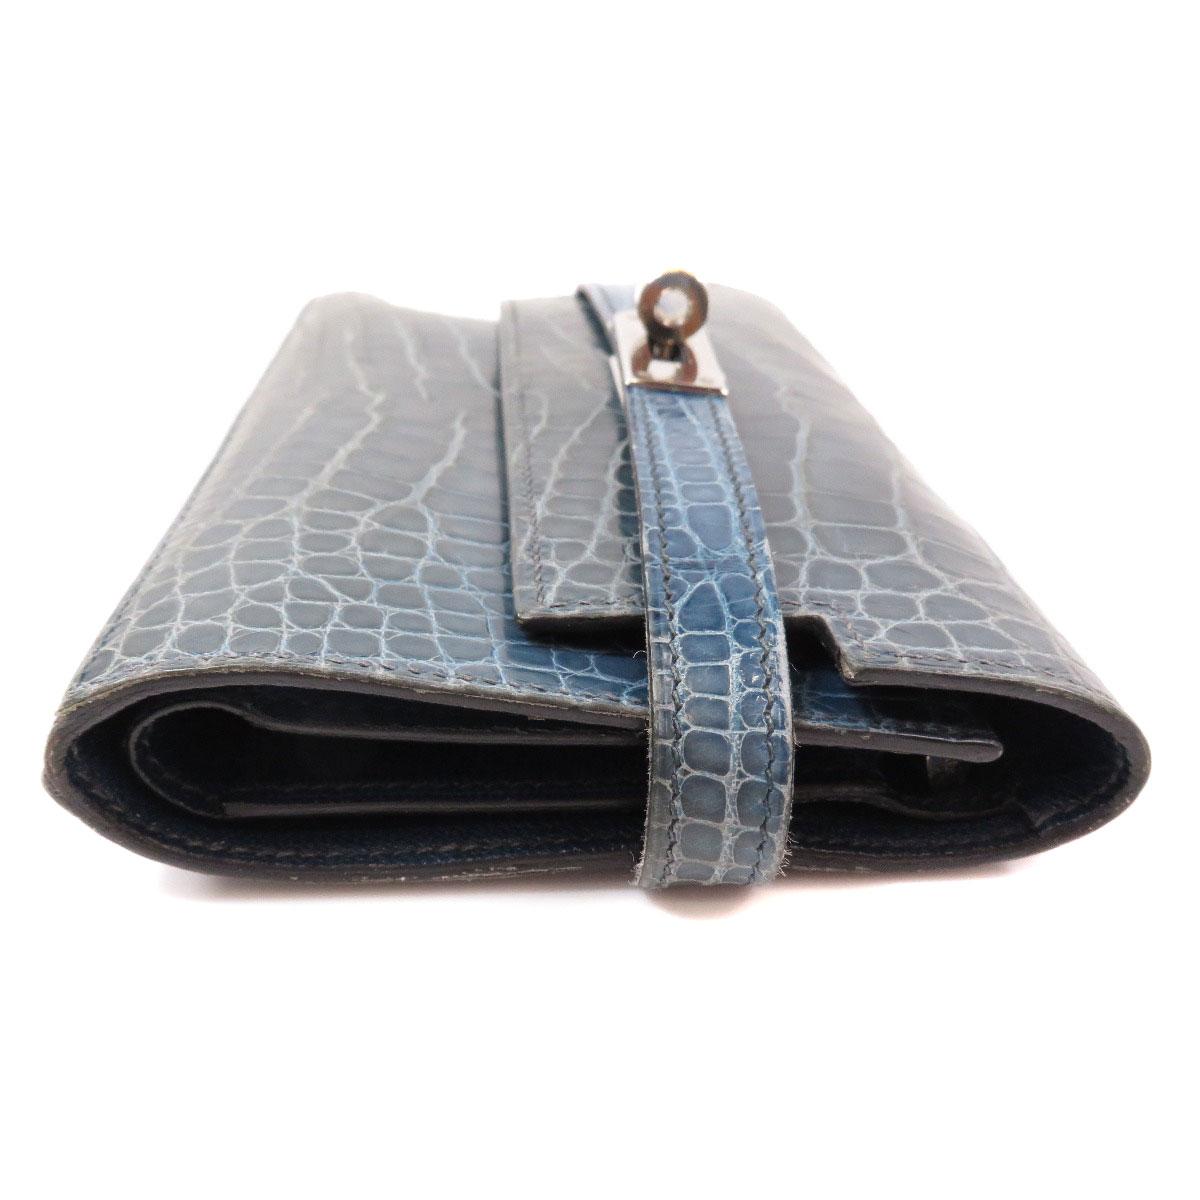 000886fe232d ... HERMES ケリーウォレット 二つ折り財布(小銭入れあり) クロコダイル レディース ...